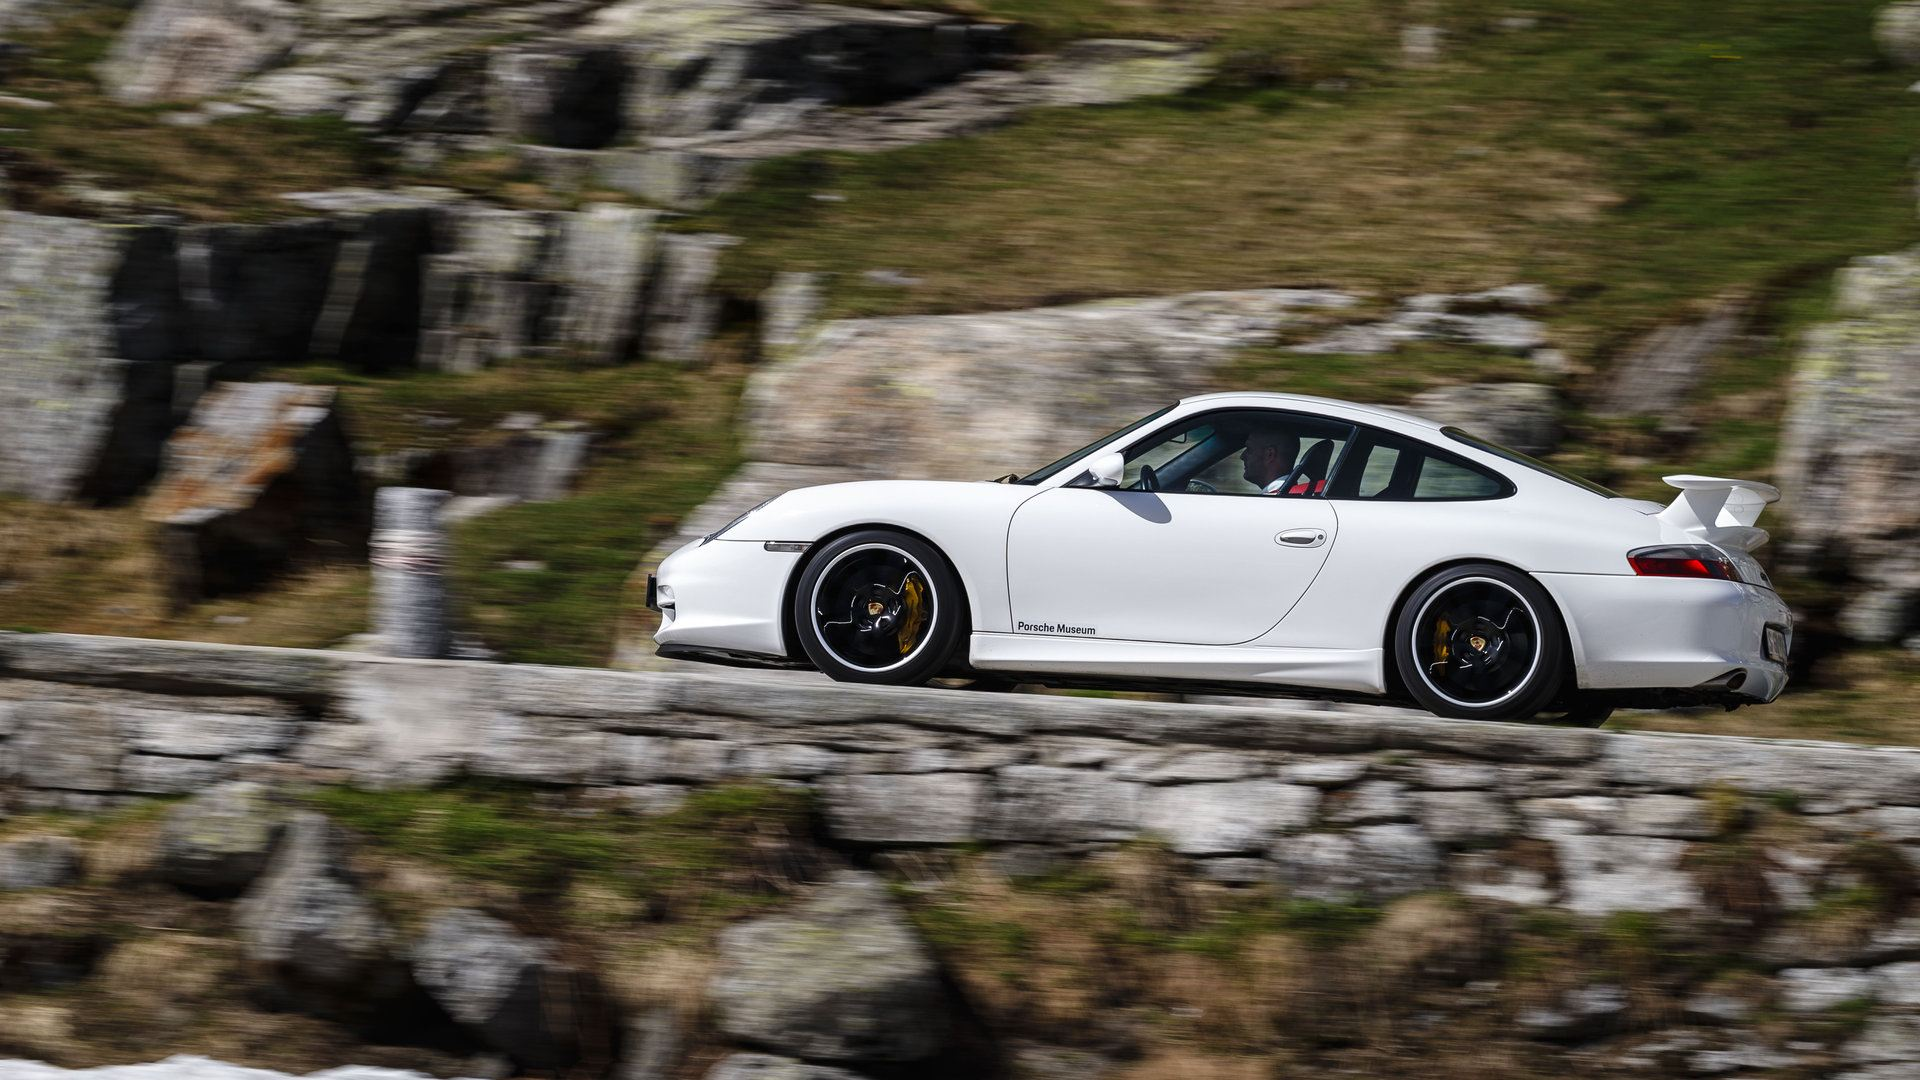 Porsche 911 GT3 997 lateral 2006